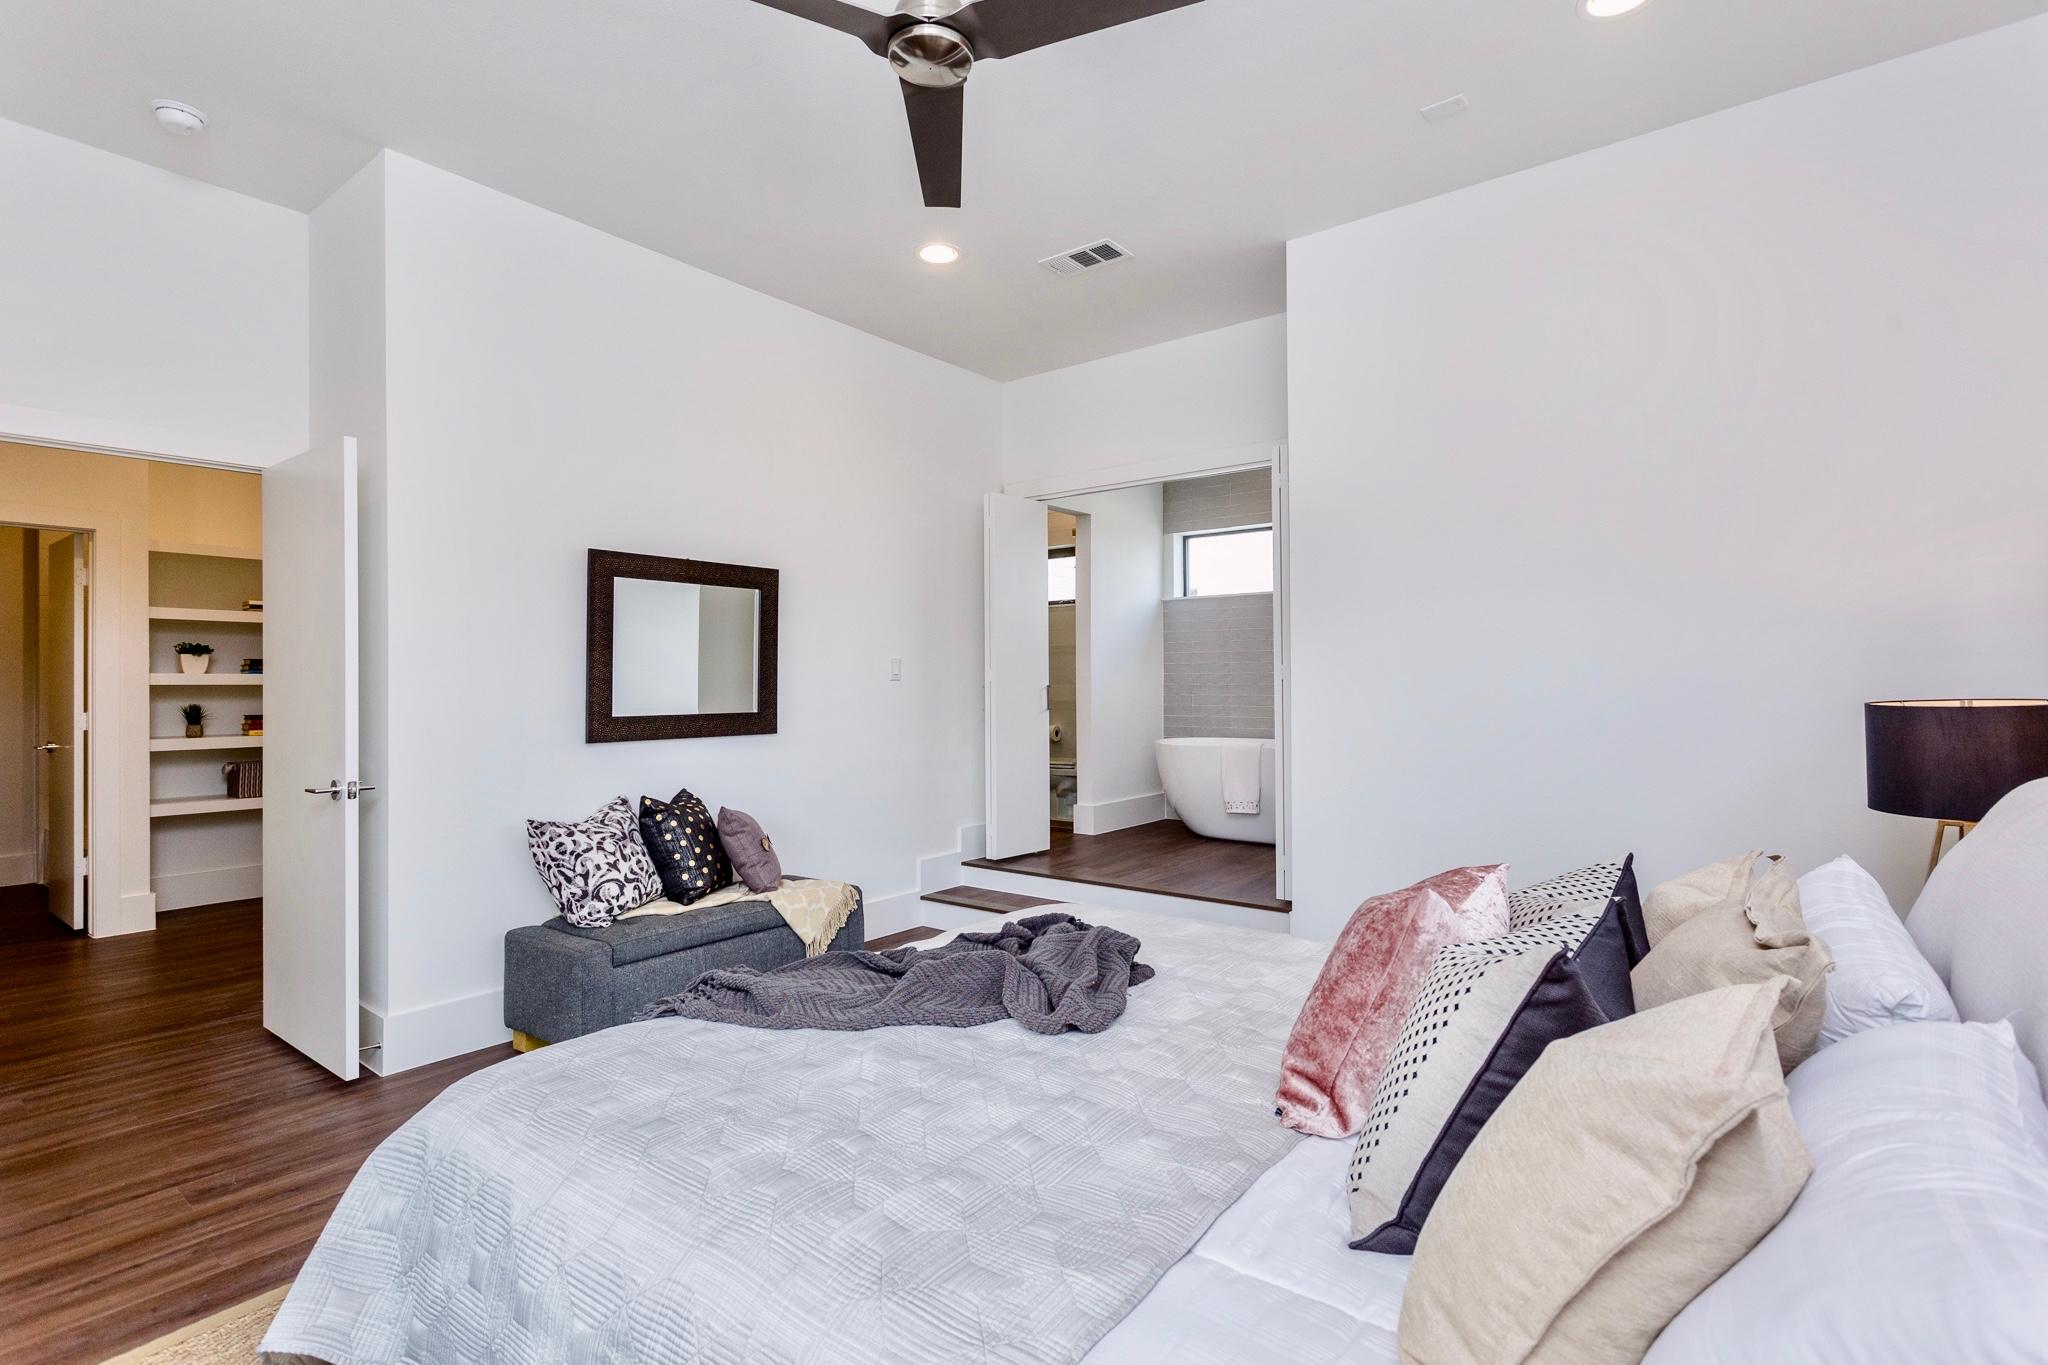 The elegant master bedroom invites relaxation.